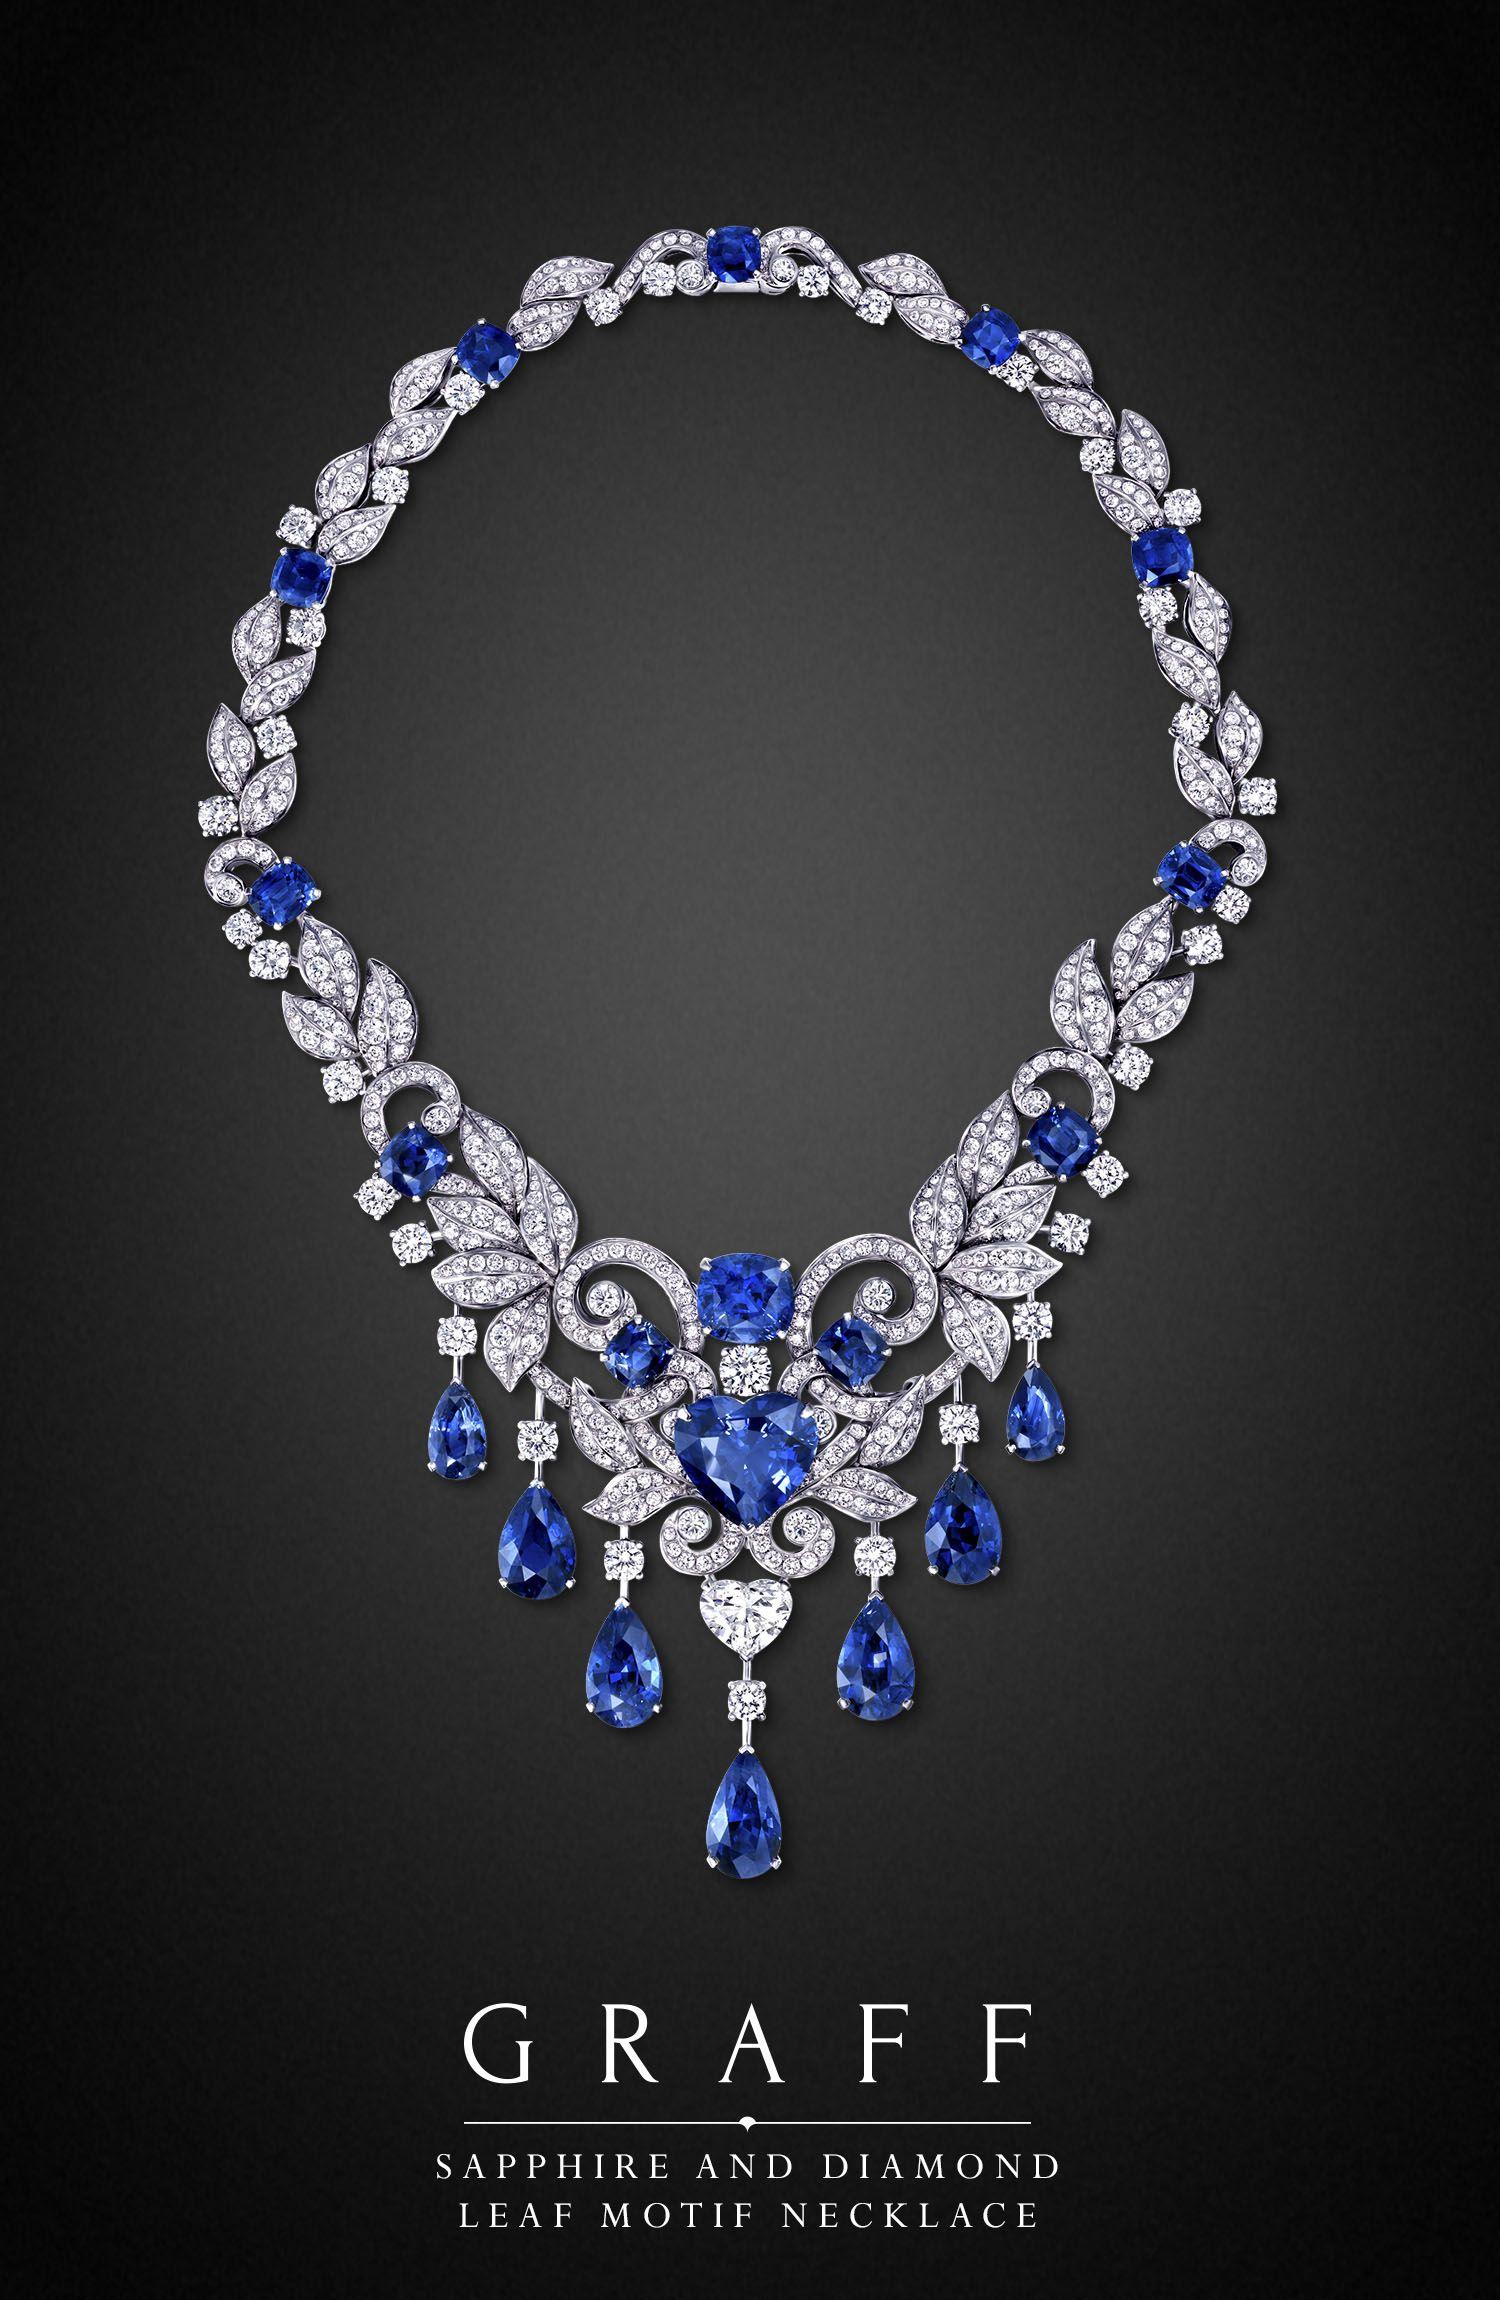 Sapphire and Diamond Leaf Motif Necklace GraffDiamonds 1 500